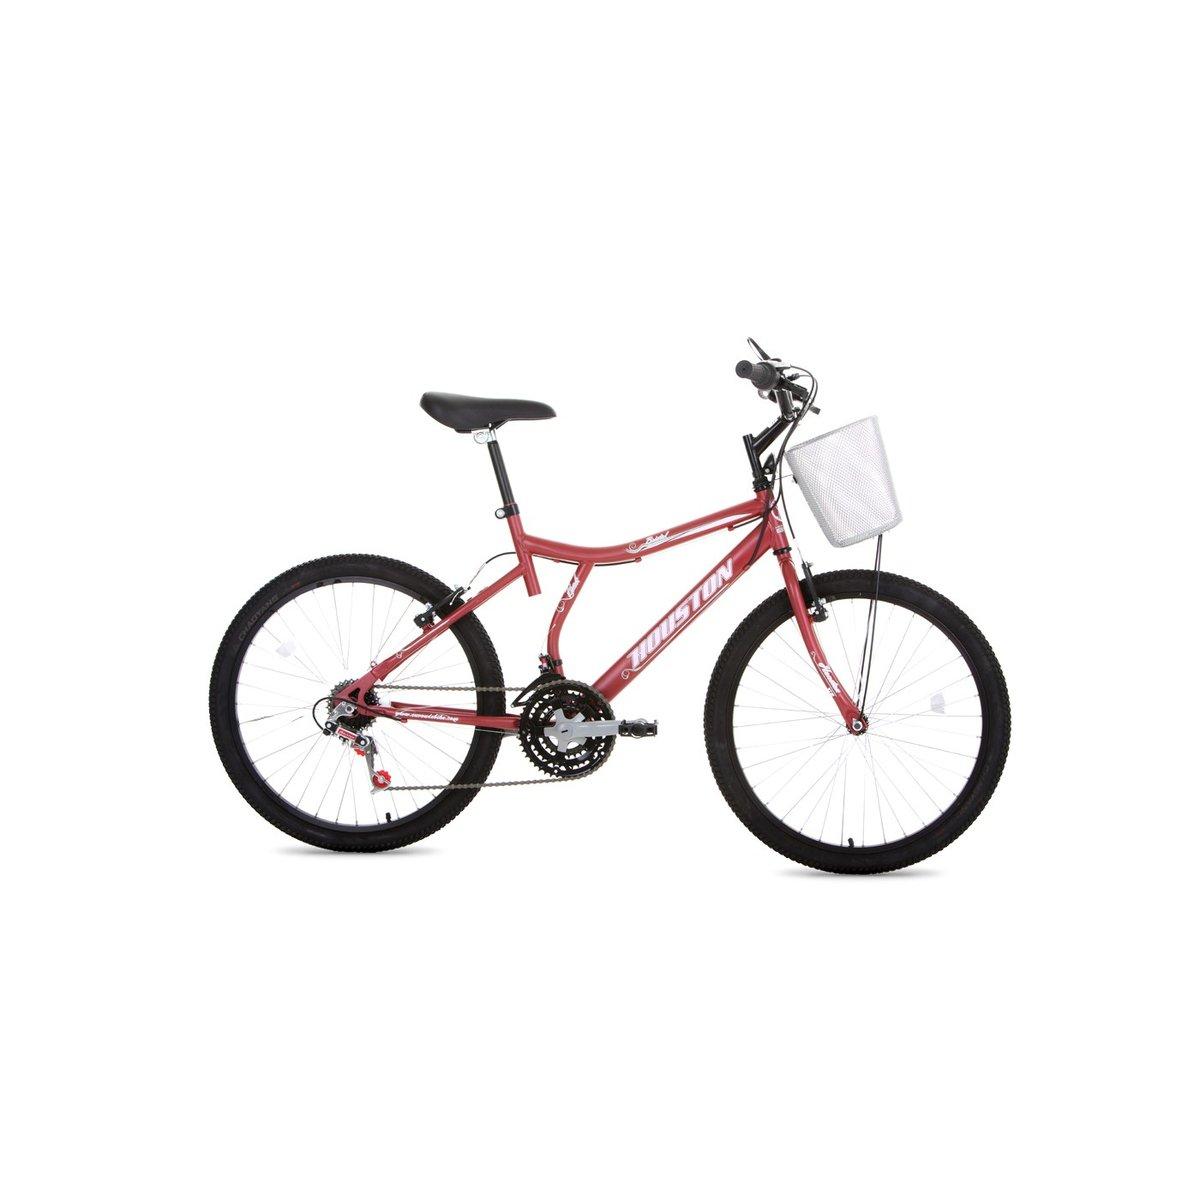 1831eafa8 Bicicleta Houston Bristol Peak Aro 24 Quadro Tamanho 18